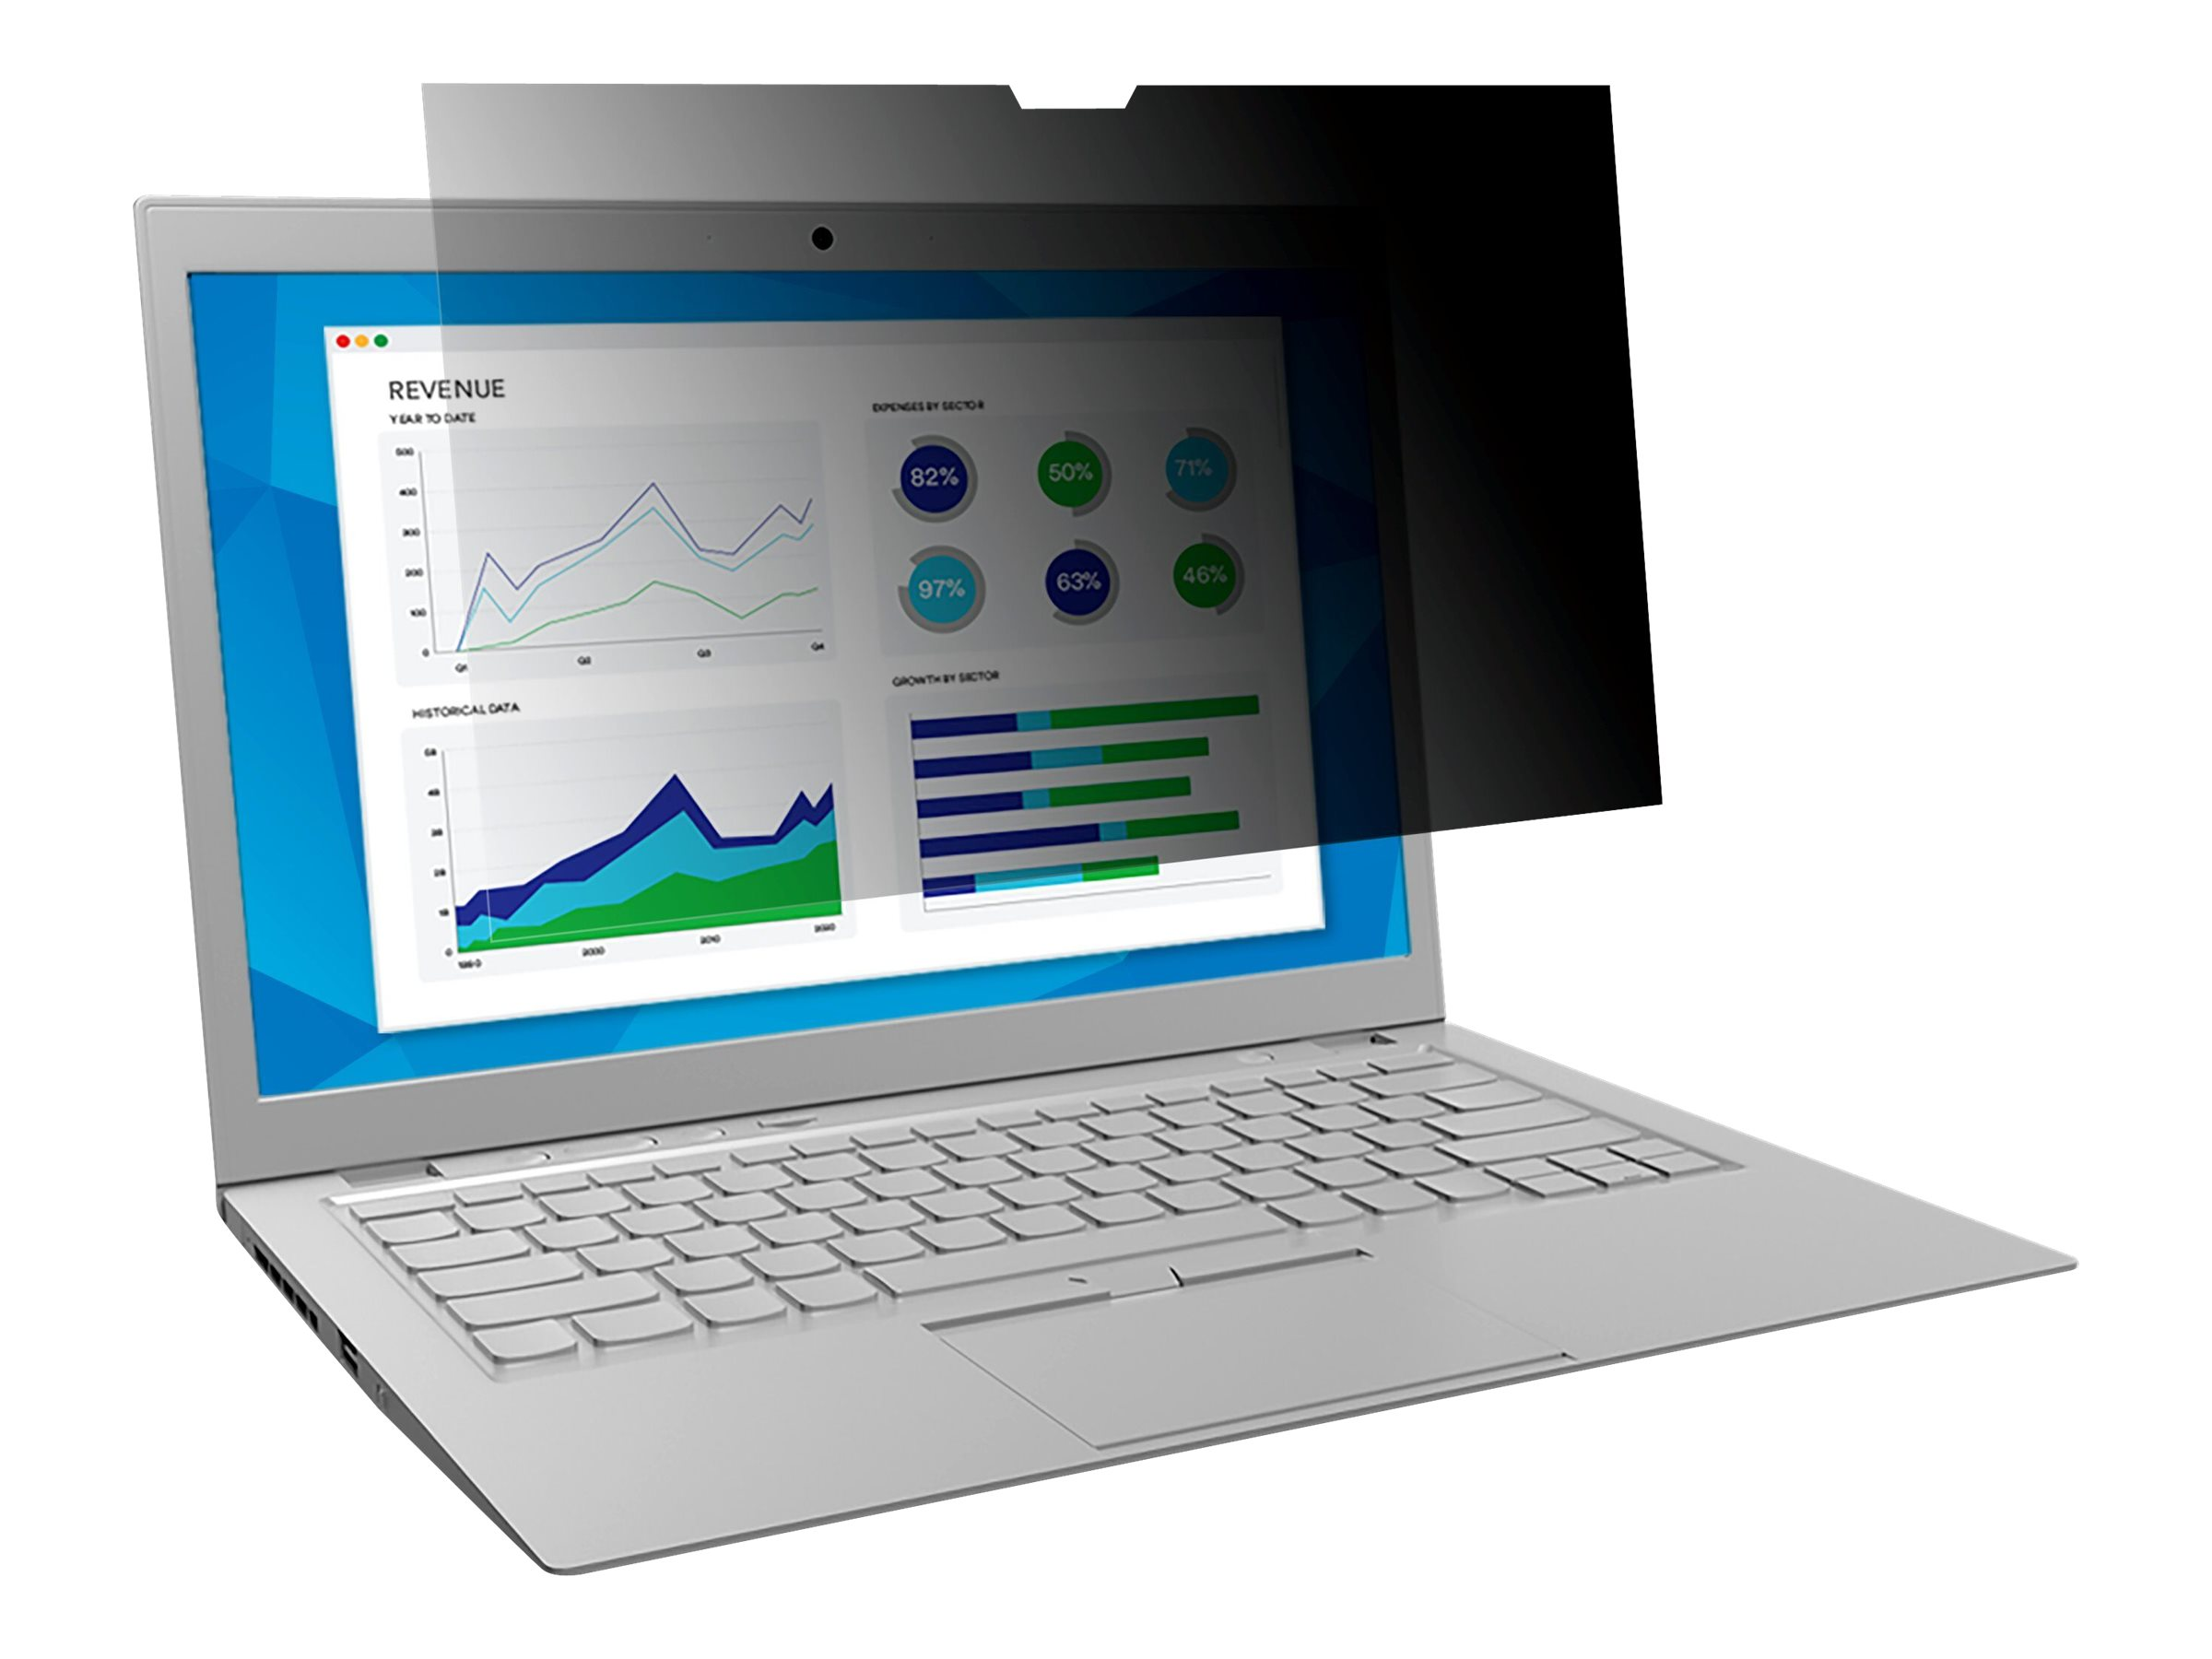 3M Blickschutzfilter für Notebook - 33,8 cm Breitbild (13,3 Zoll Breitbild)